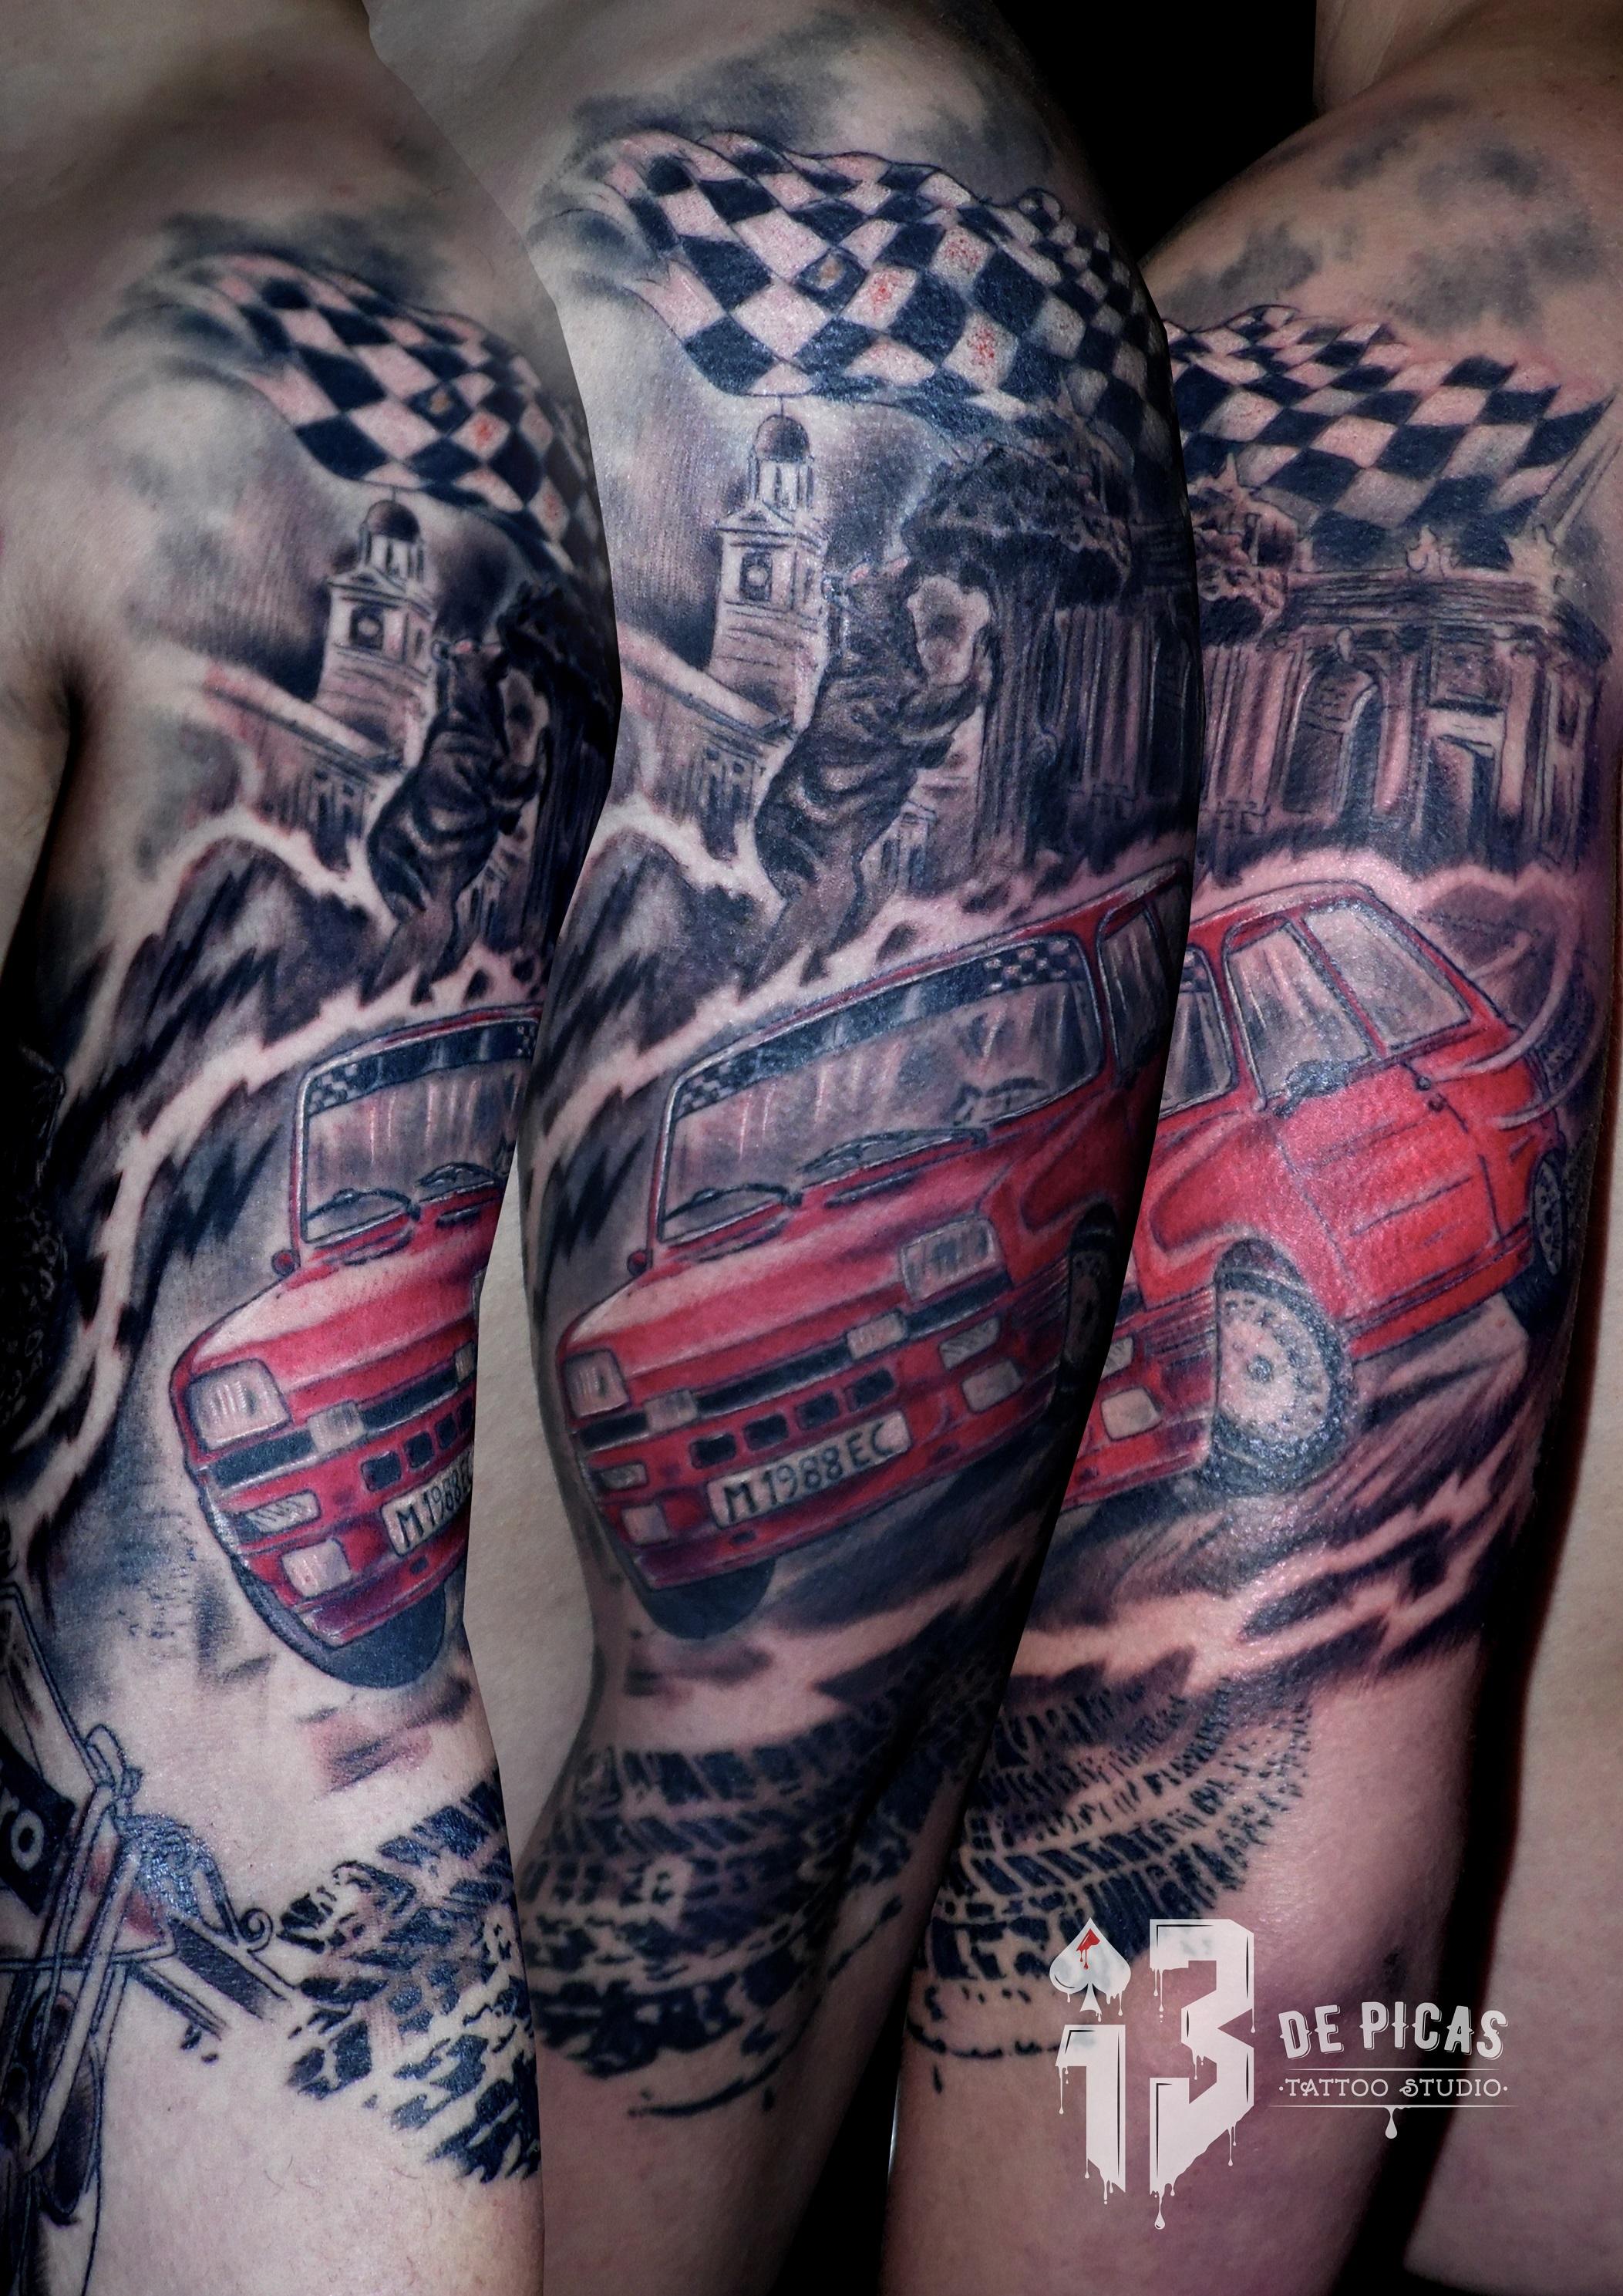 r5turbo tatuaje tattoo coche Madrid rallie oso madroño brazo hombro realista 13depicas jaca huesca color